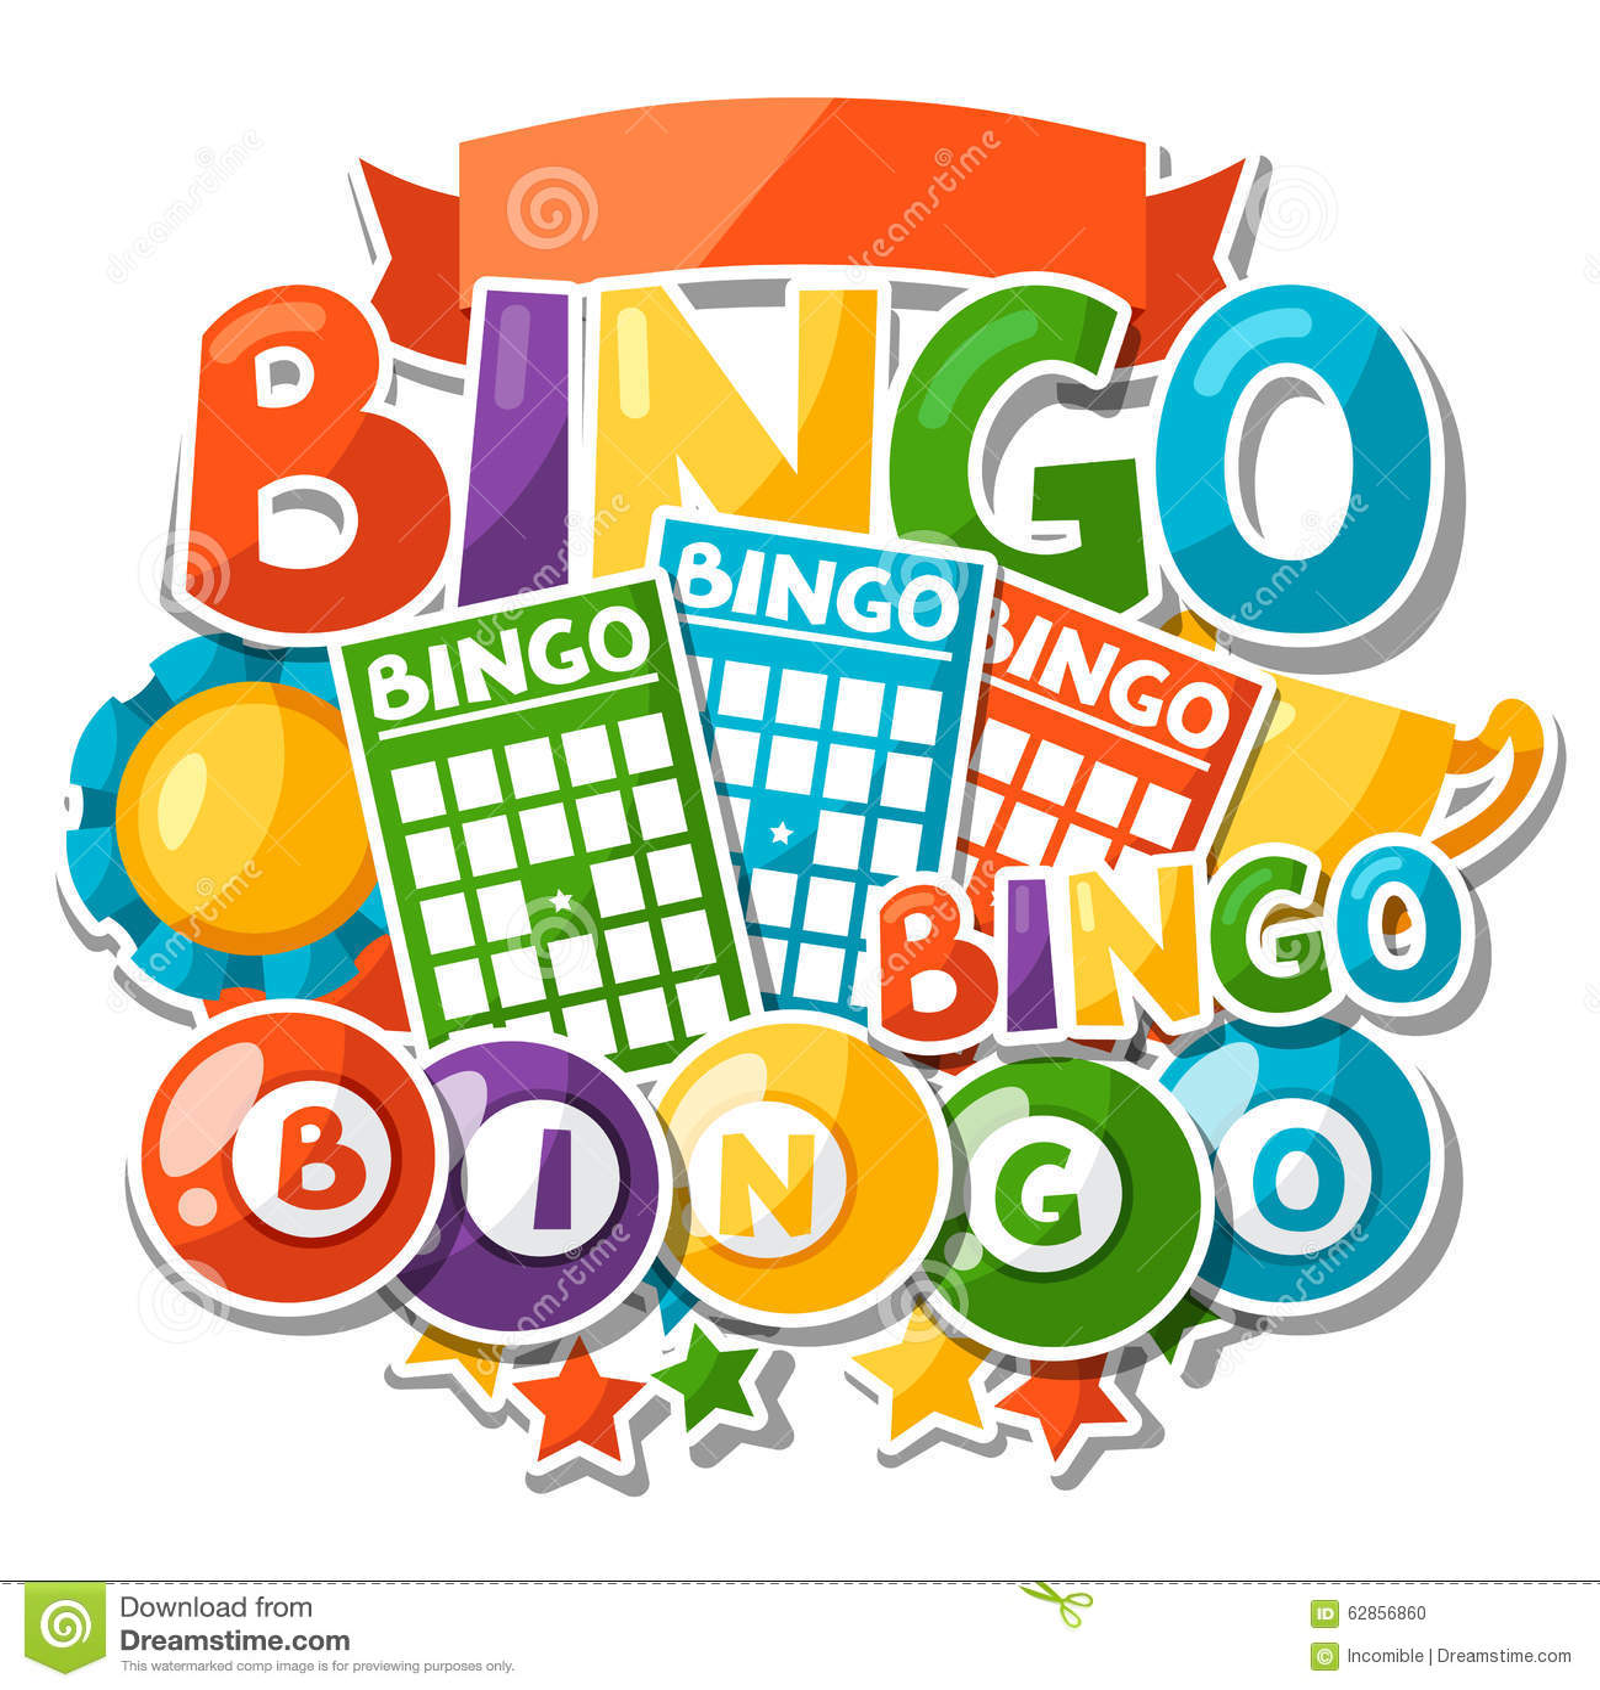 free bingo clipart downloads - photo #36